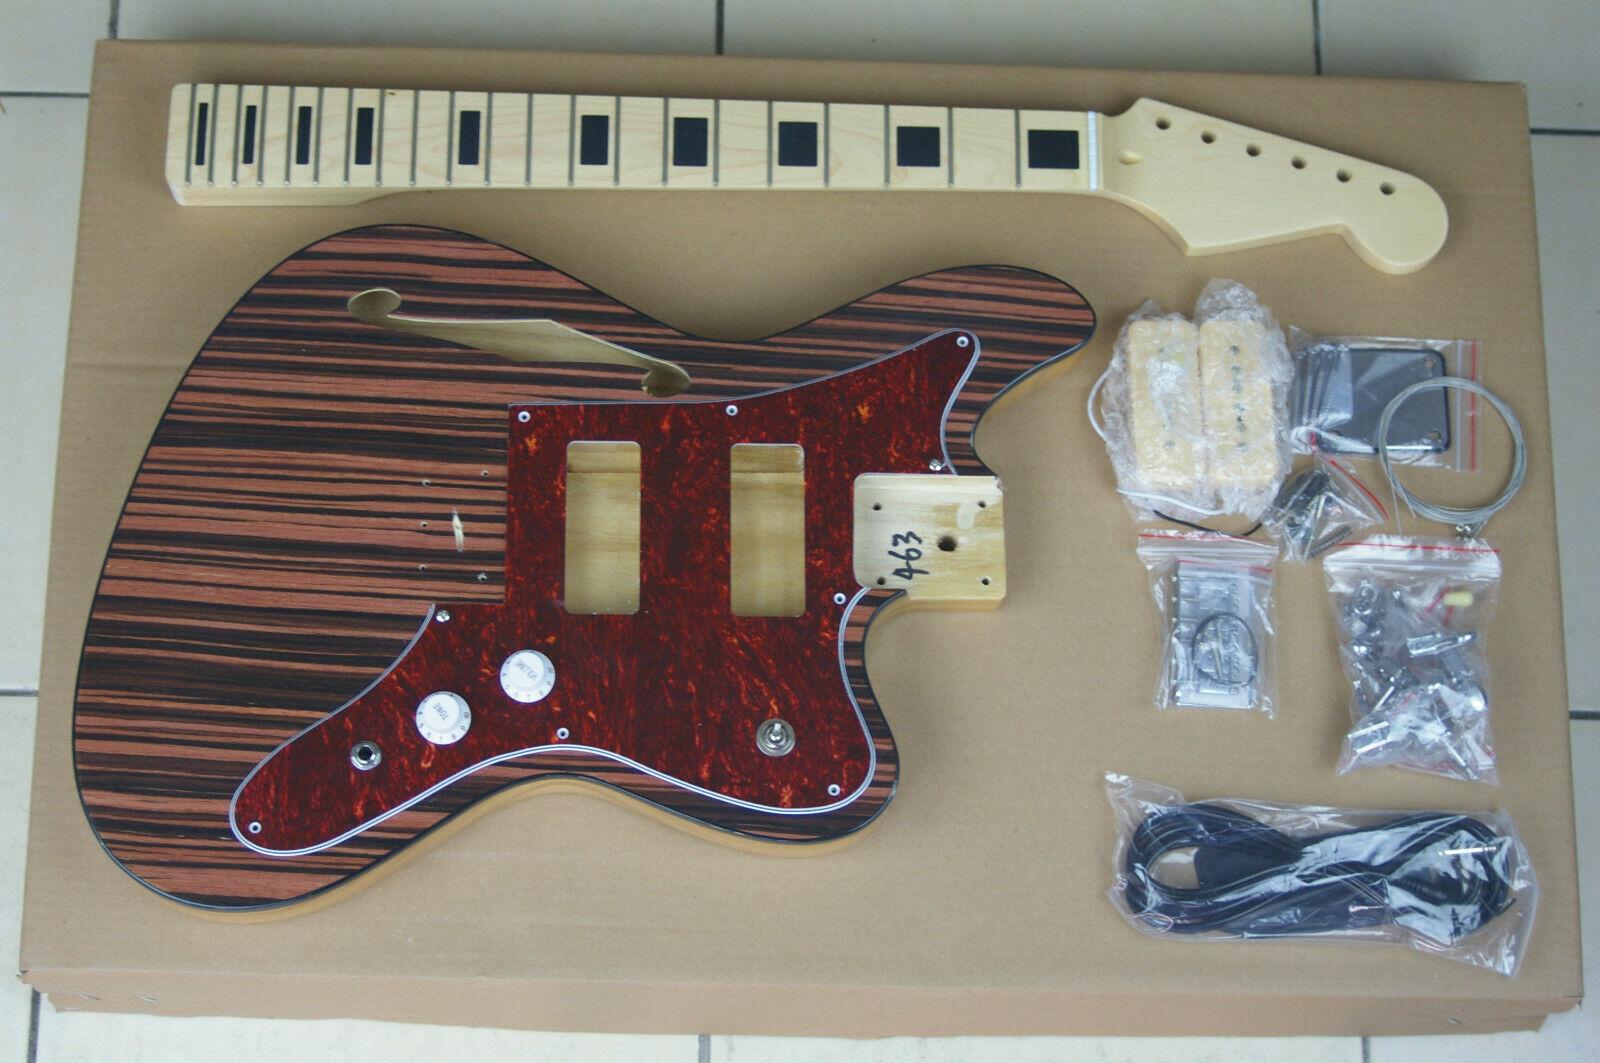 DIY Build Your Own GUITAR KIT J Master Thinline Edge Bound Dark Zebra Wood Top